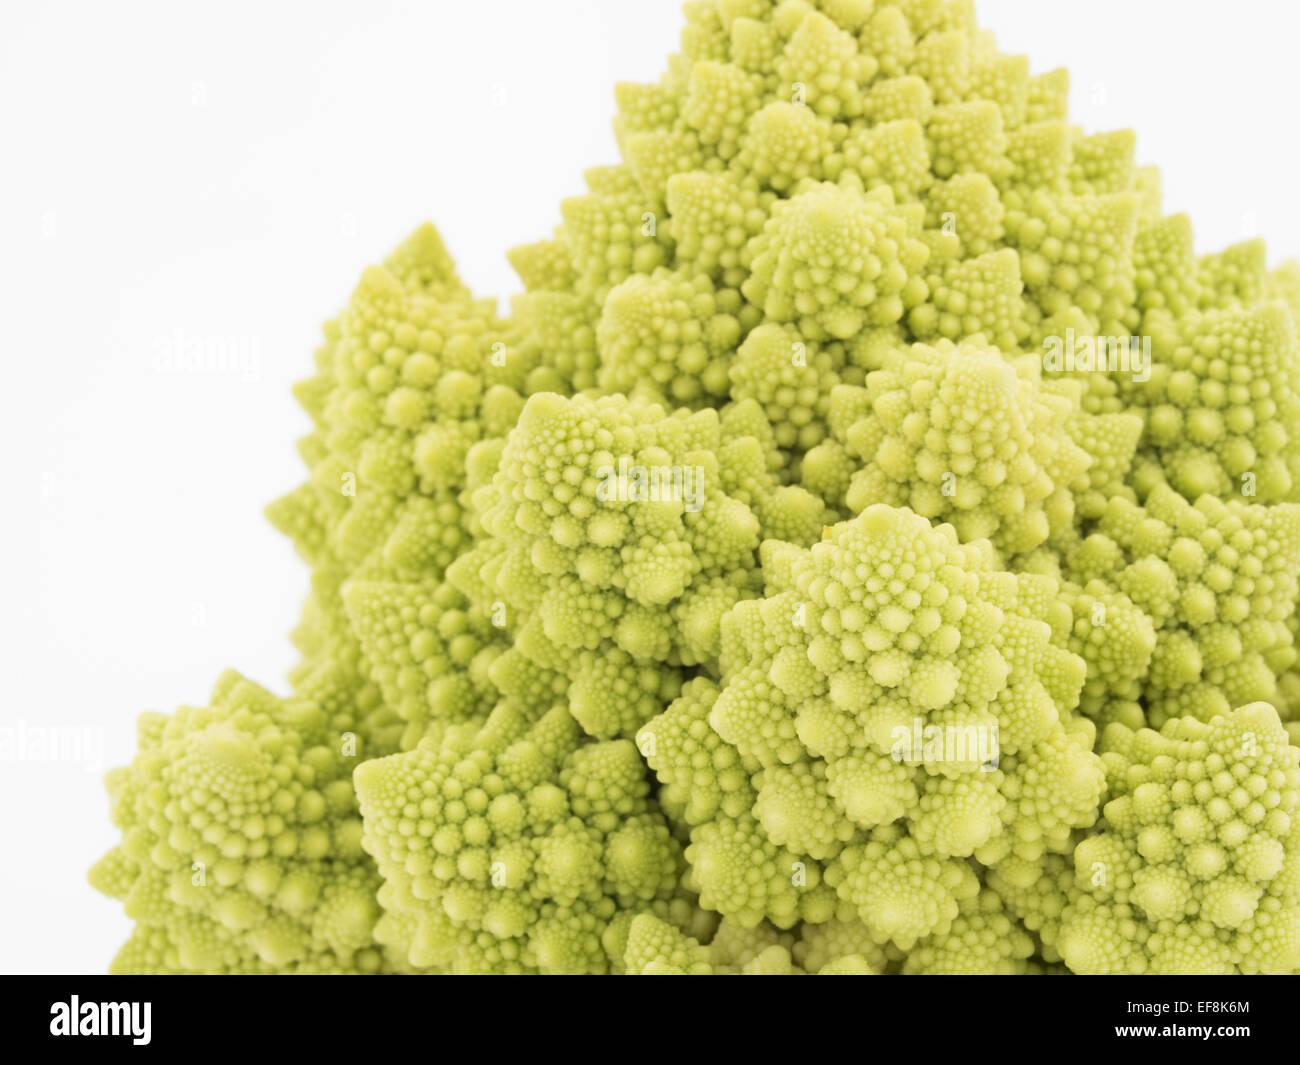 Broccoli Flower Stock Photos Broccoli Flower Stock Images Alamy